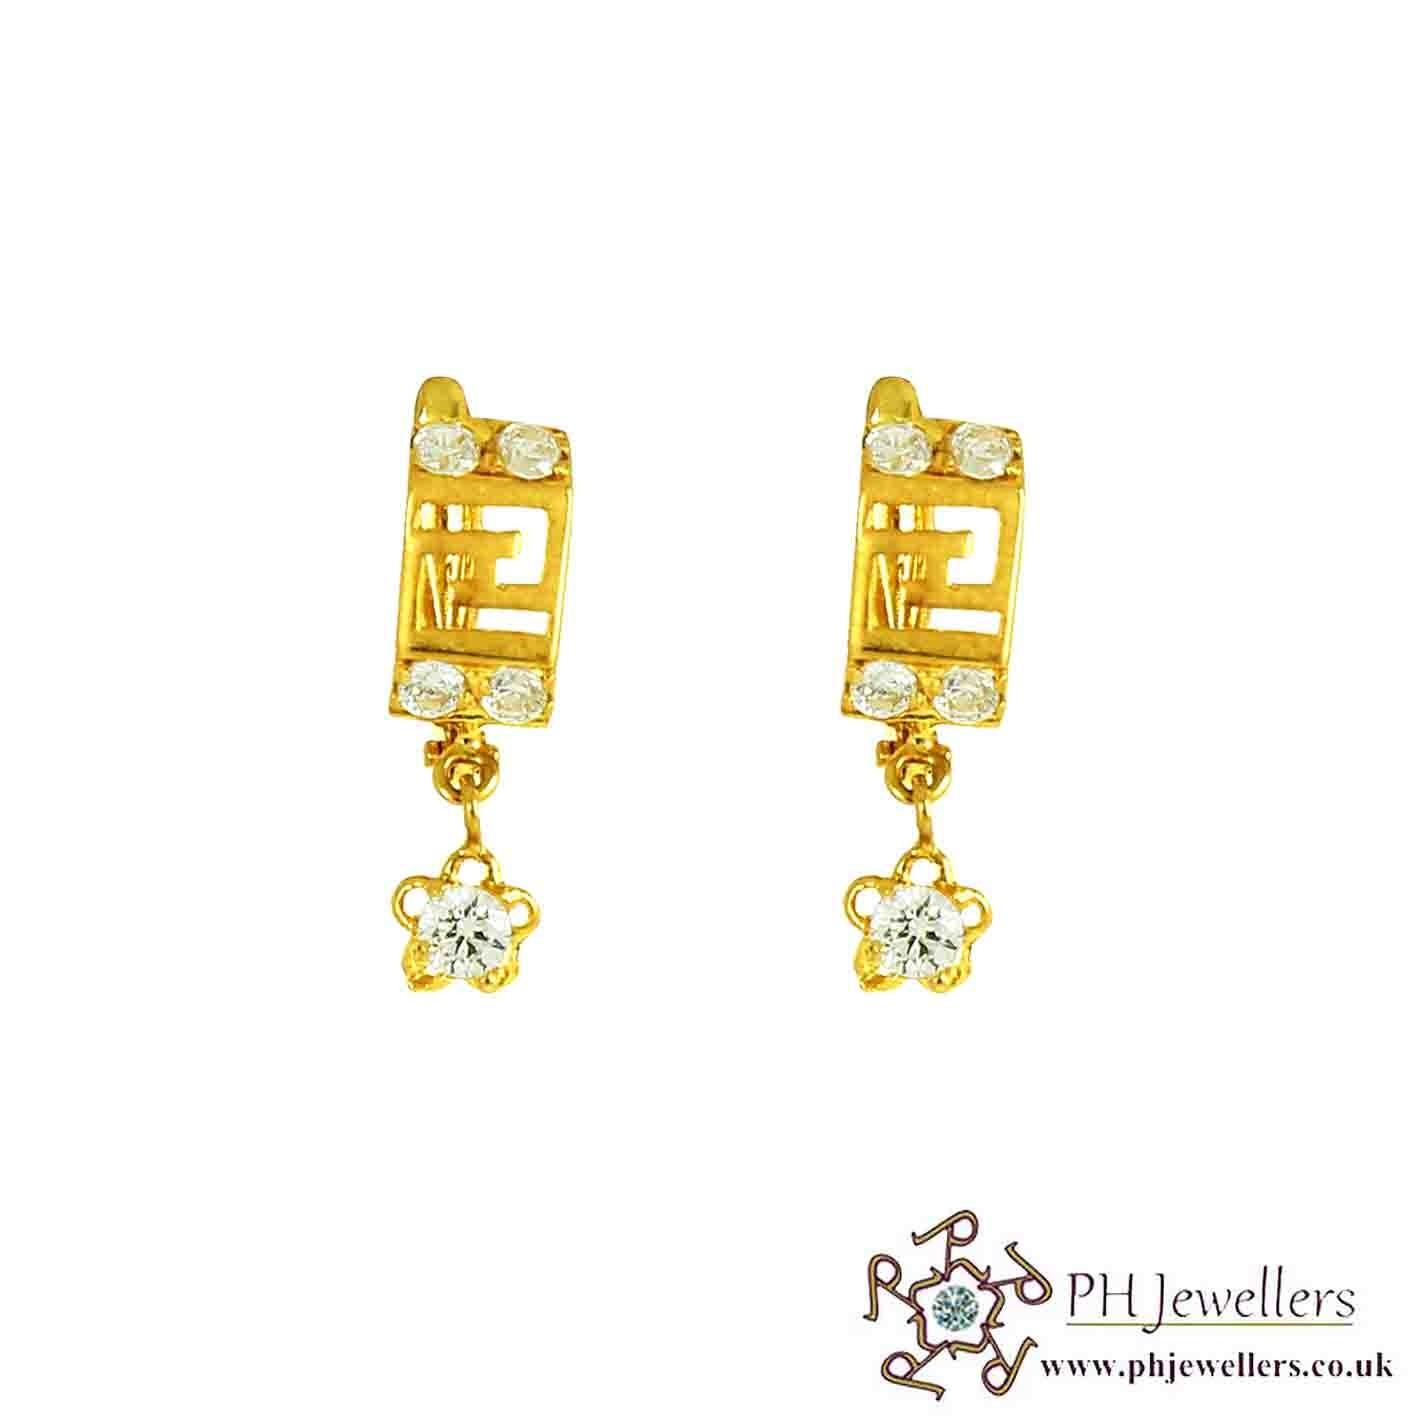 22ct 916 Hallmark Yellow Gold Clip On-Dangle Earring CZ CE31